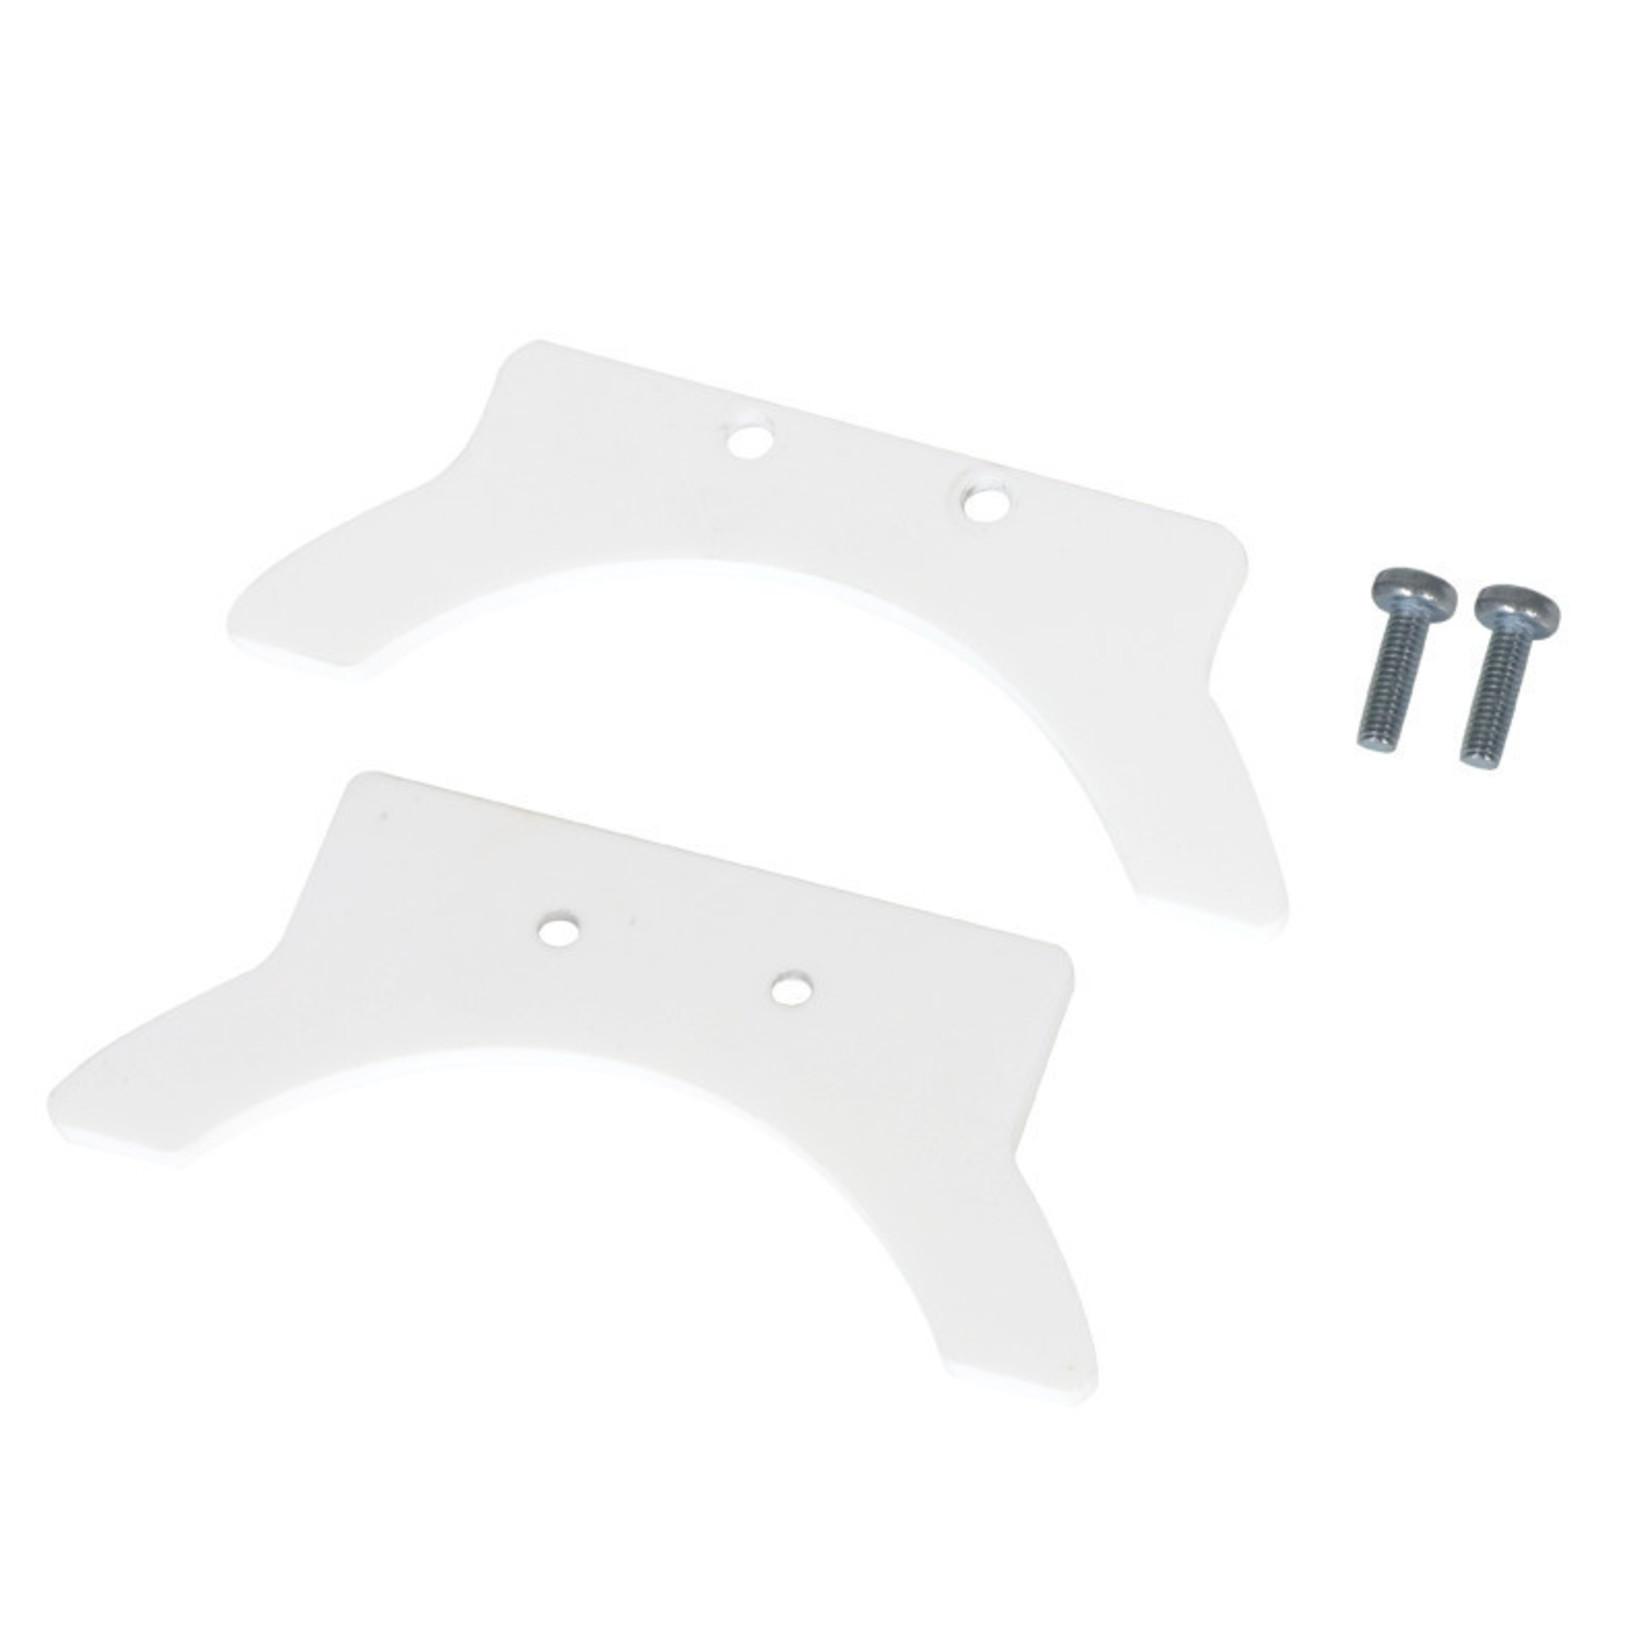 Kitronik Bumper accessoire voor :MOVE MINI